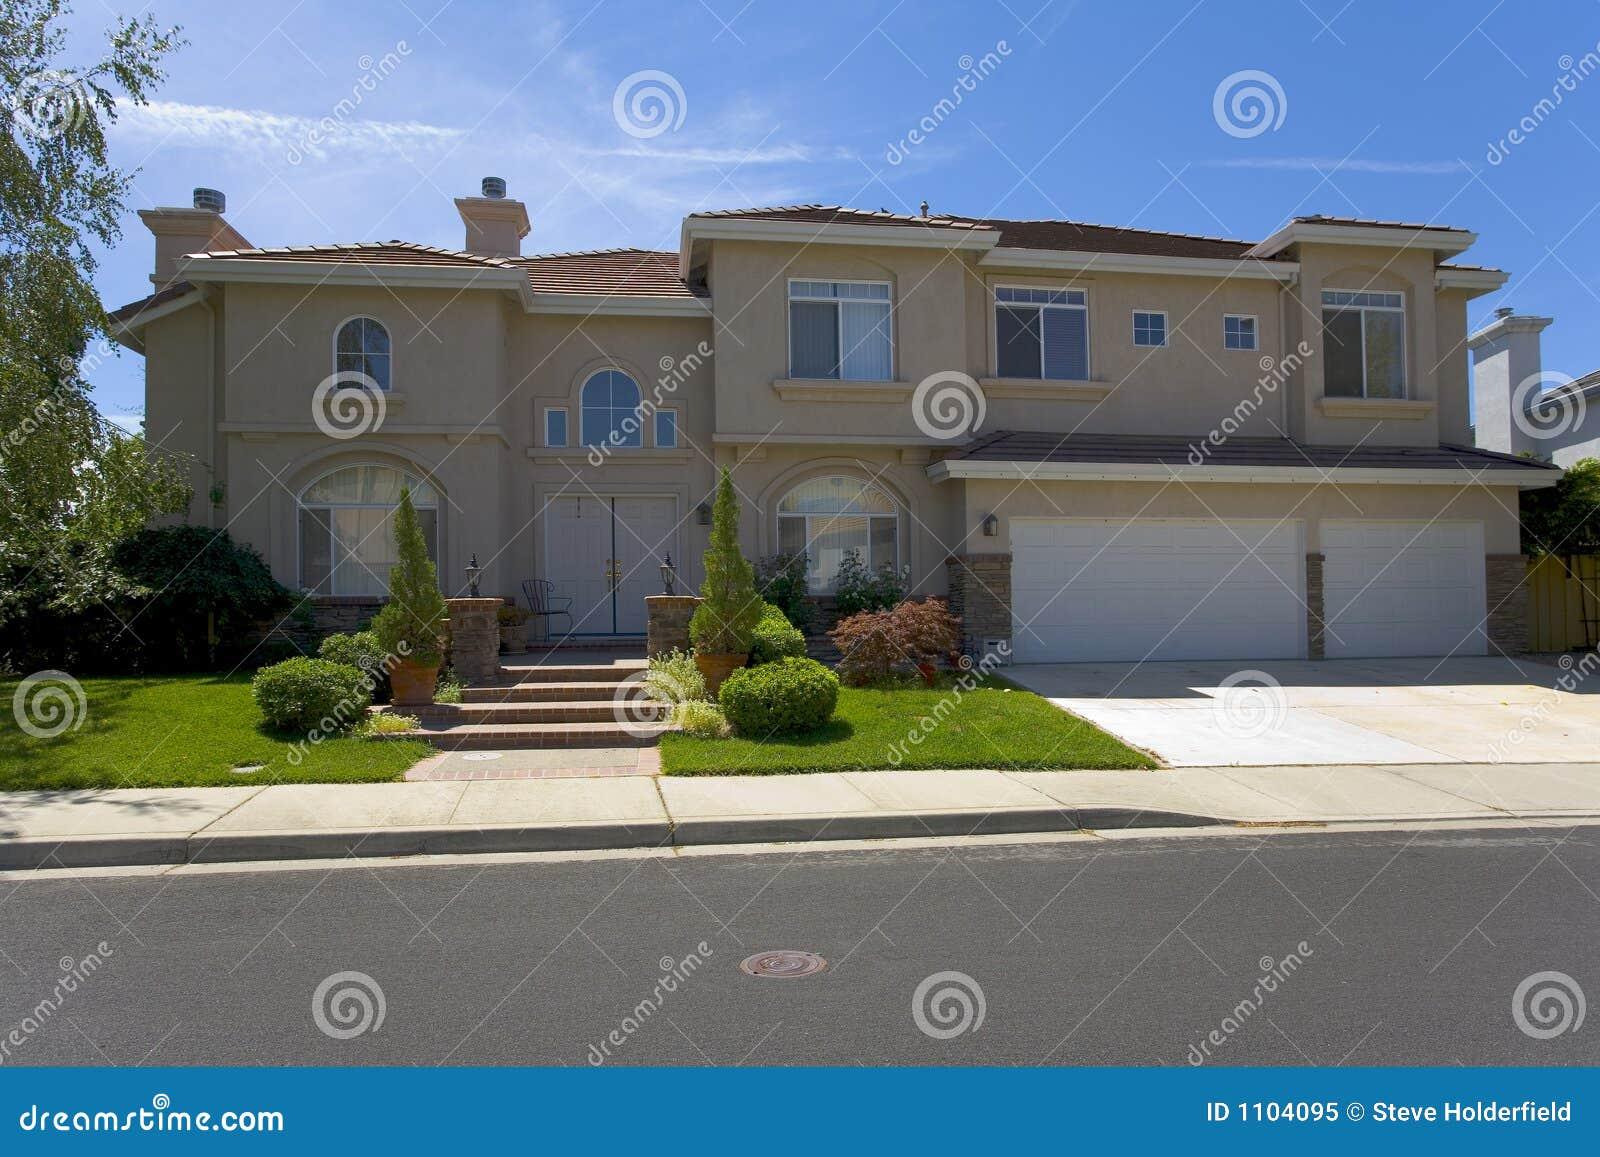 Grande maison contemporaine luxueuse de stuc image stock for Maison luxueuse moderne